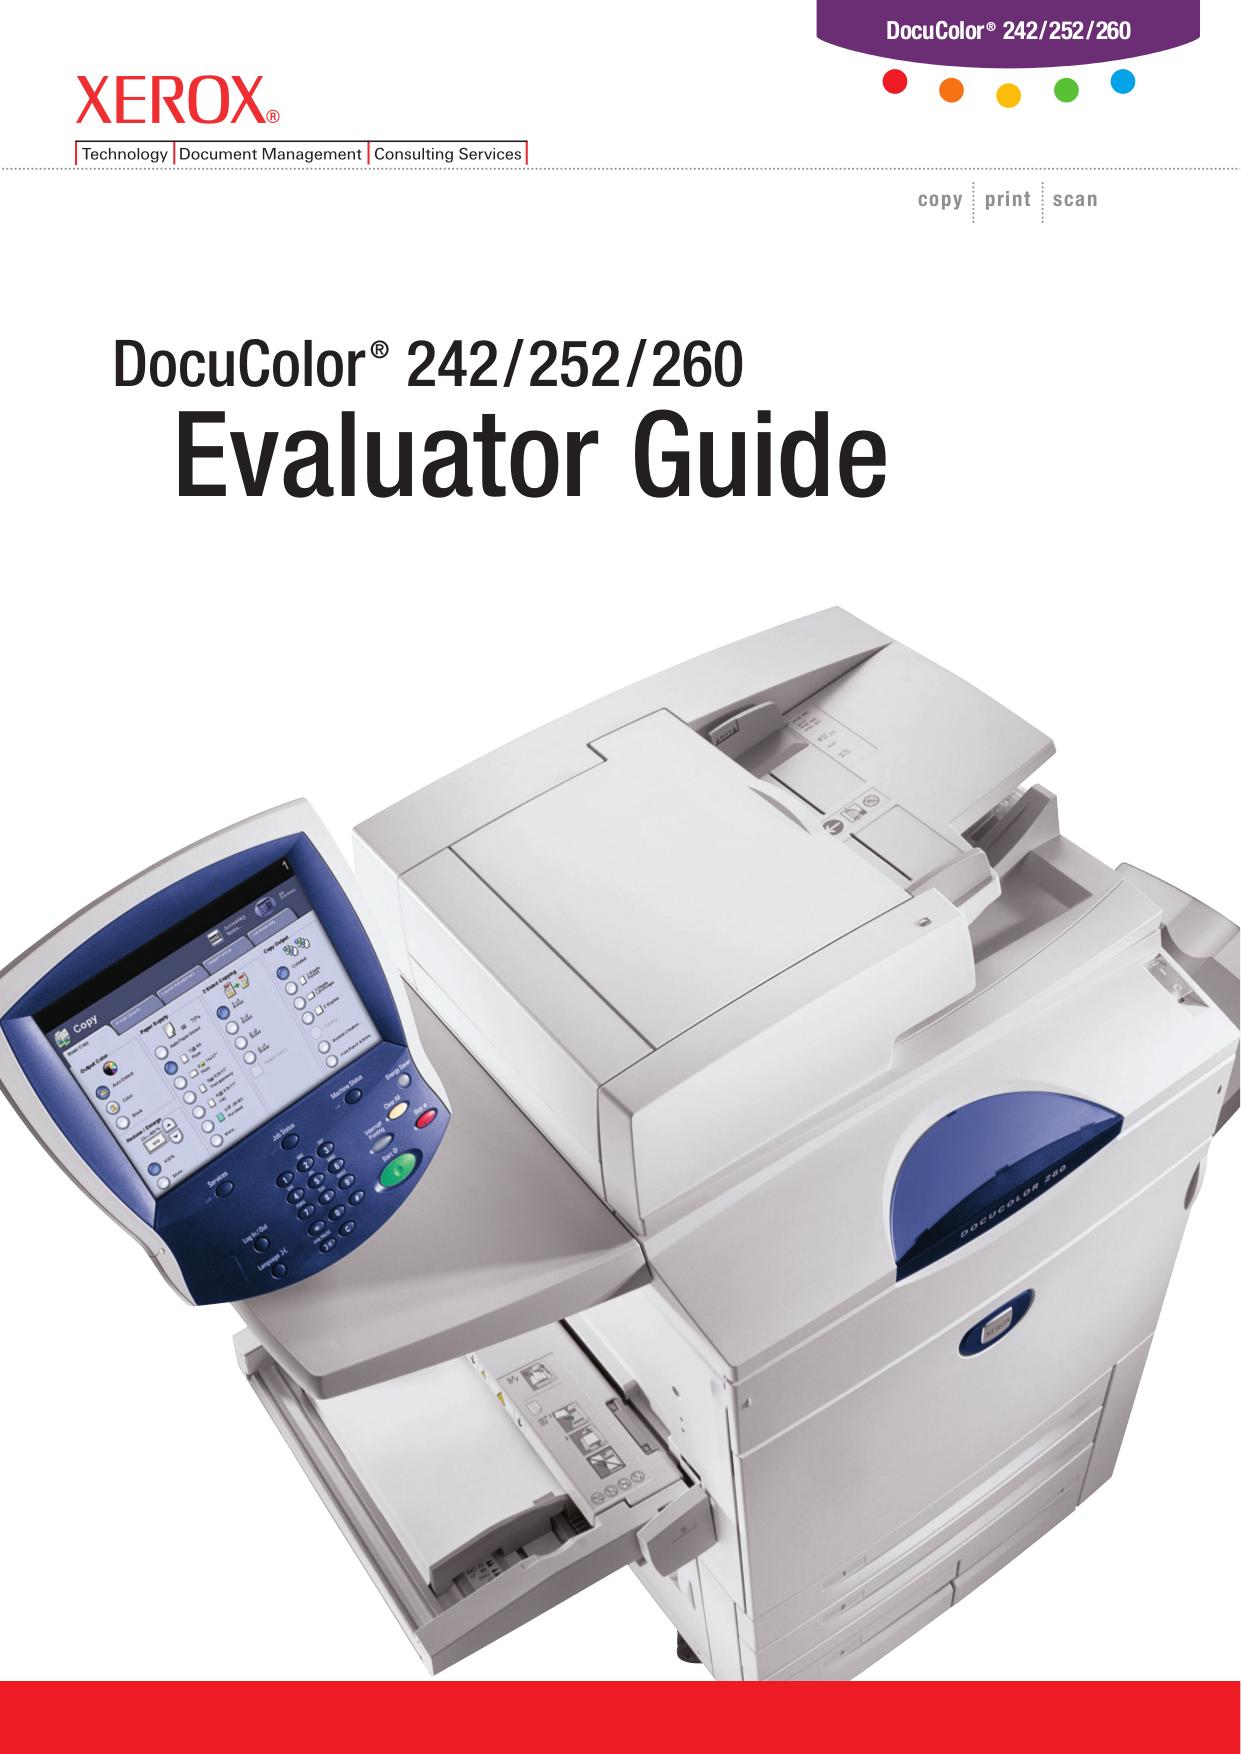 download free pdf for xerox docucolor 242 multifunction printer manual rh umlib com xerox docucolor 250 service manual Toner Xerox 250